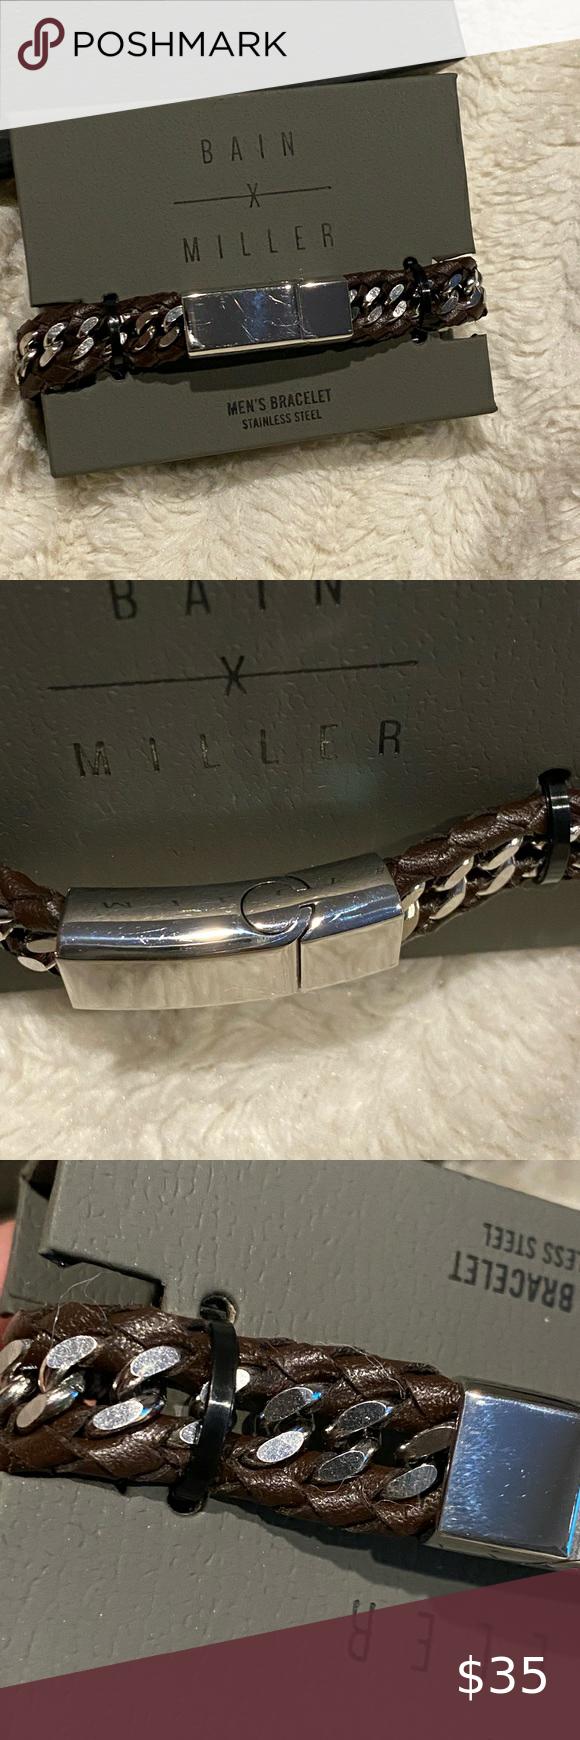 36++ Bain miller mens jewelry info